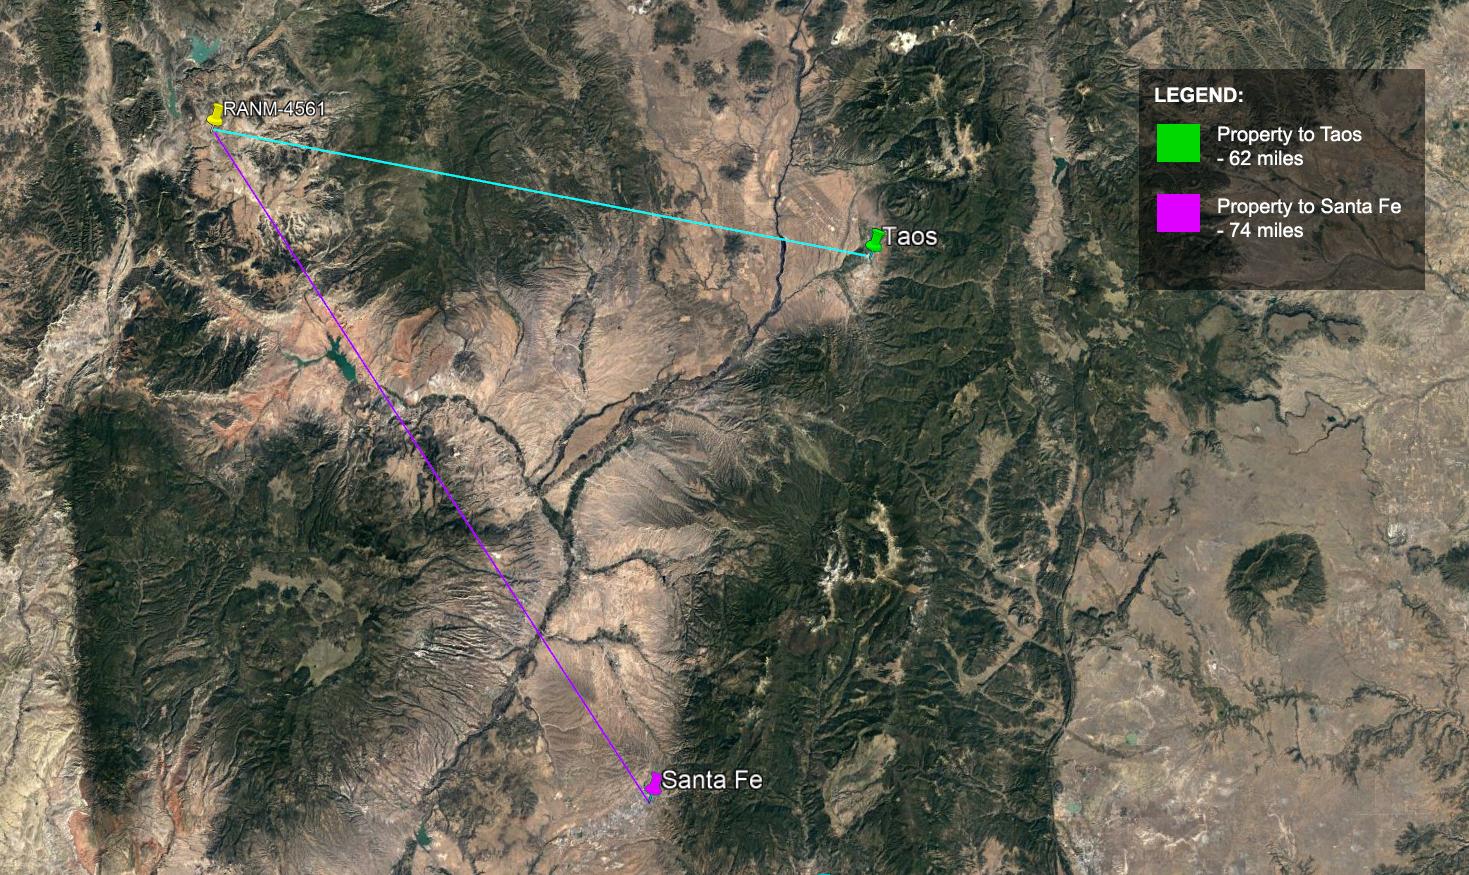 RANM-4561 Landmark1.jpg